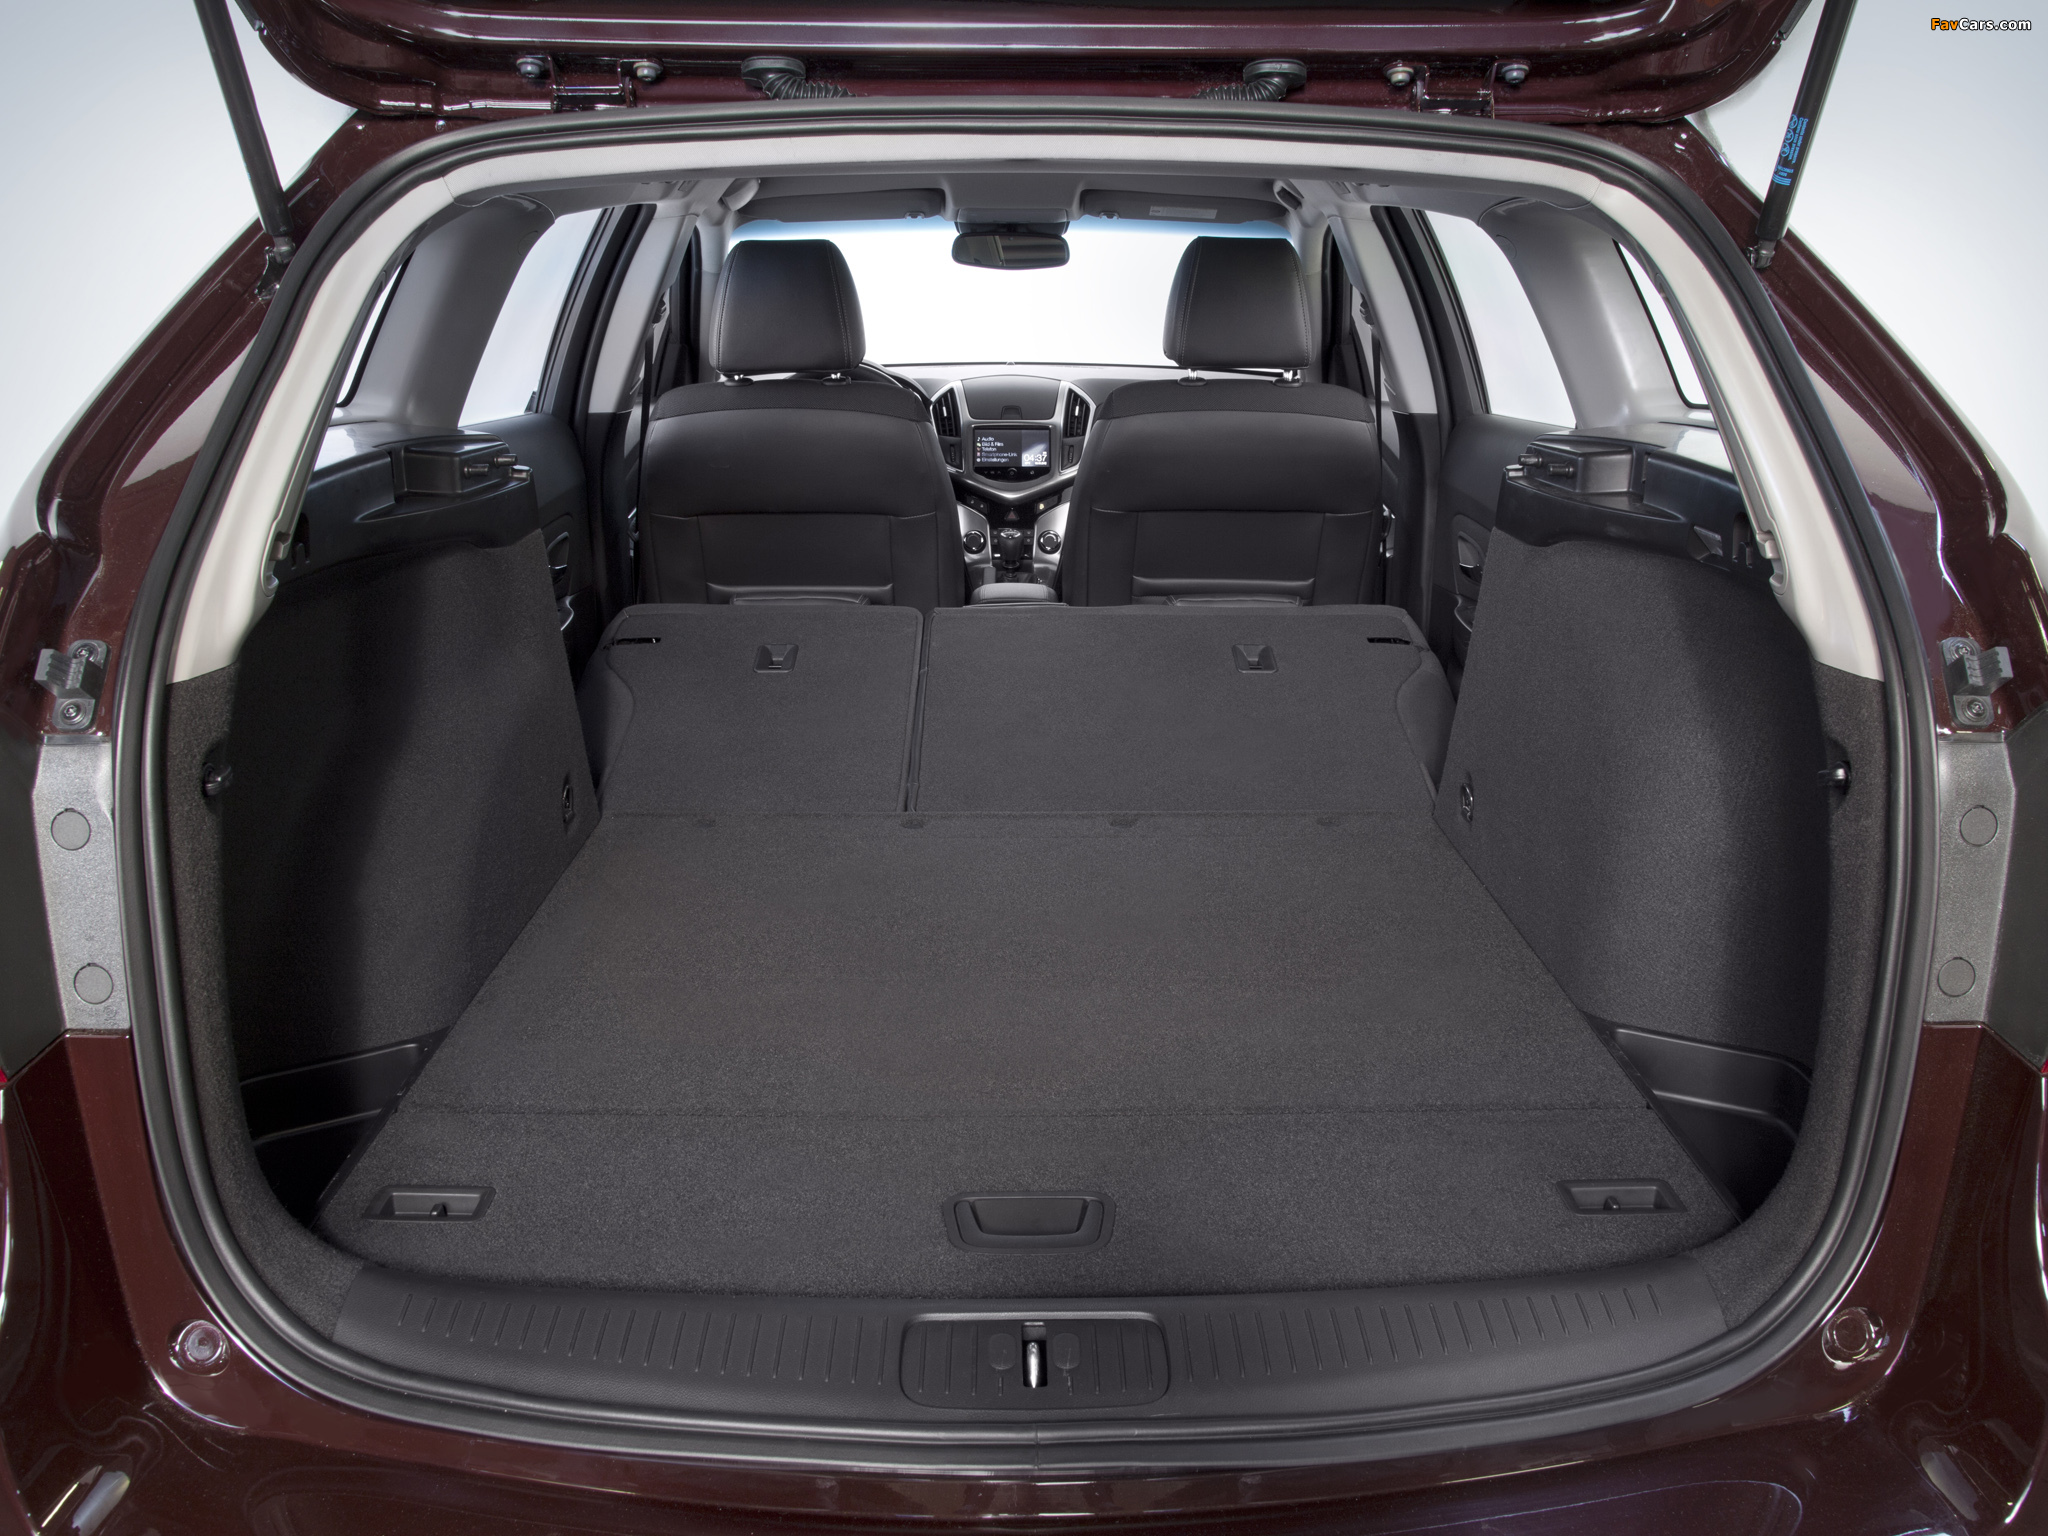 Chevrolet Cruze Station Wagon (J300) 2012 images (2048 x 1536)